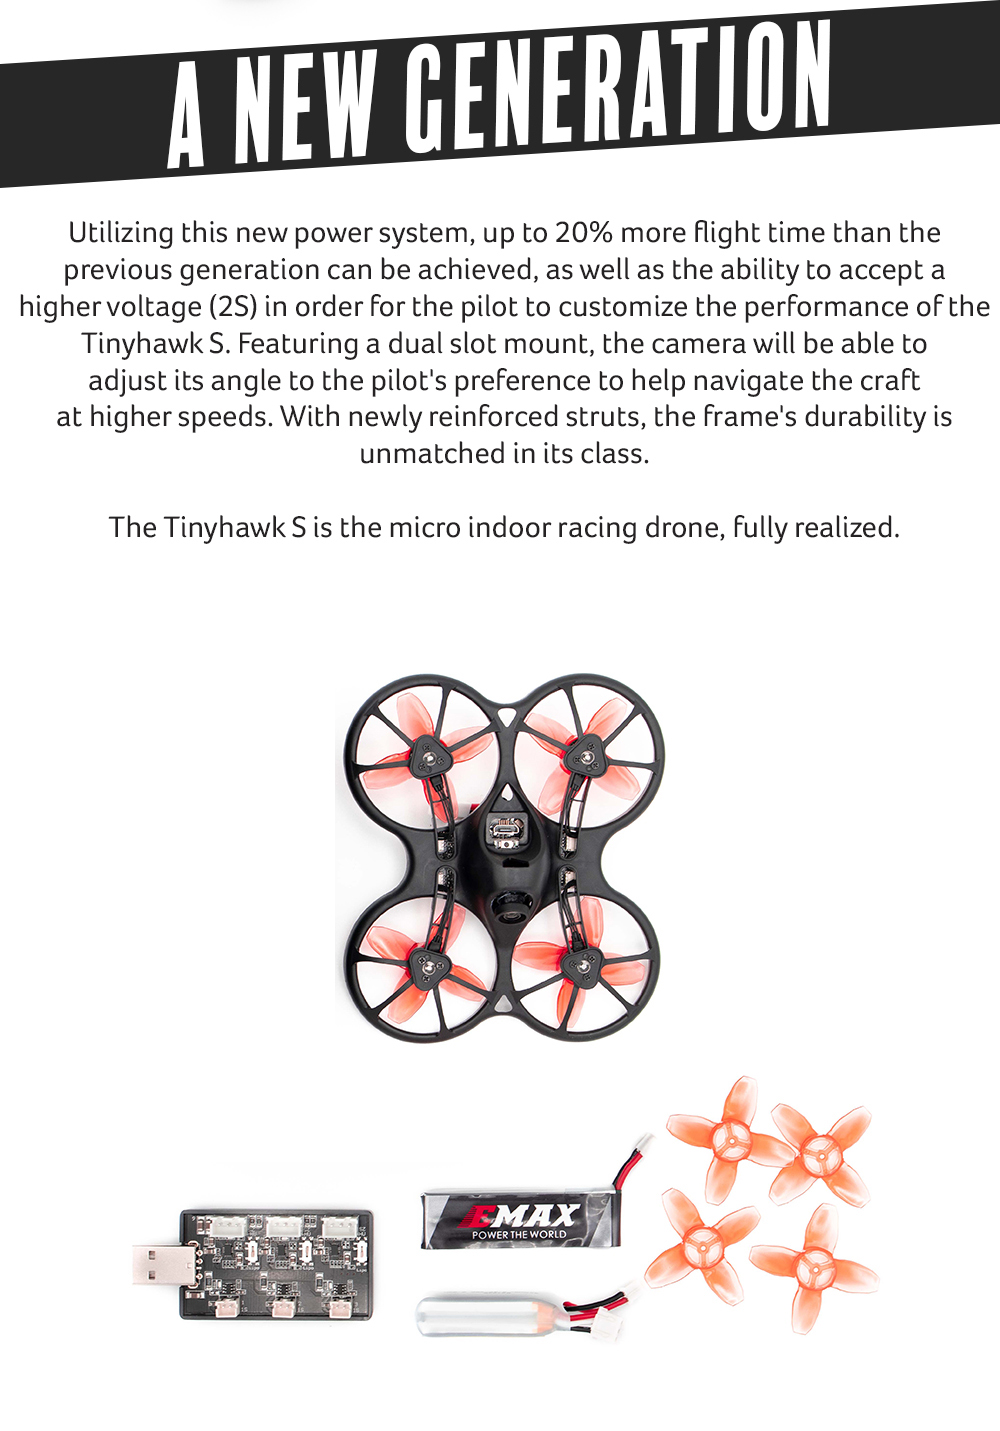 EMAX Tinhawk S 600TVL Indoor FPV Racing Drone F4 4in1